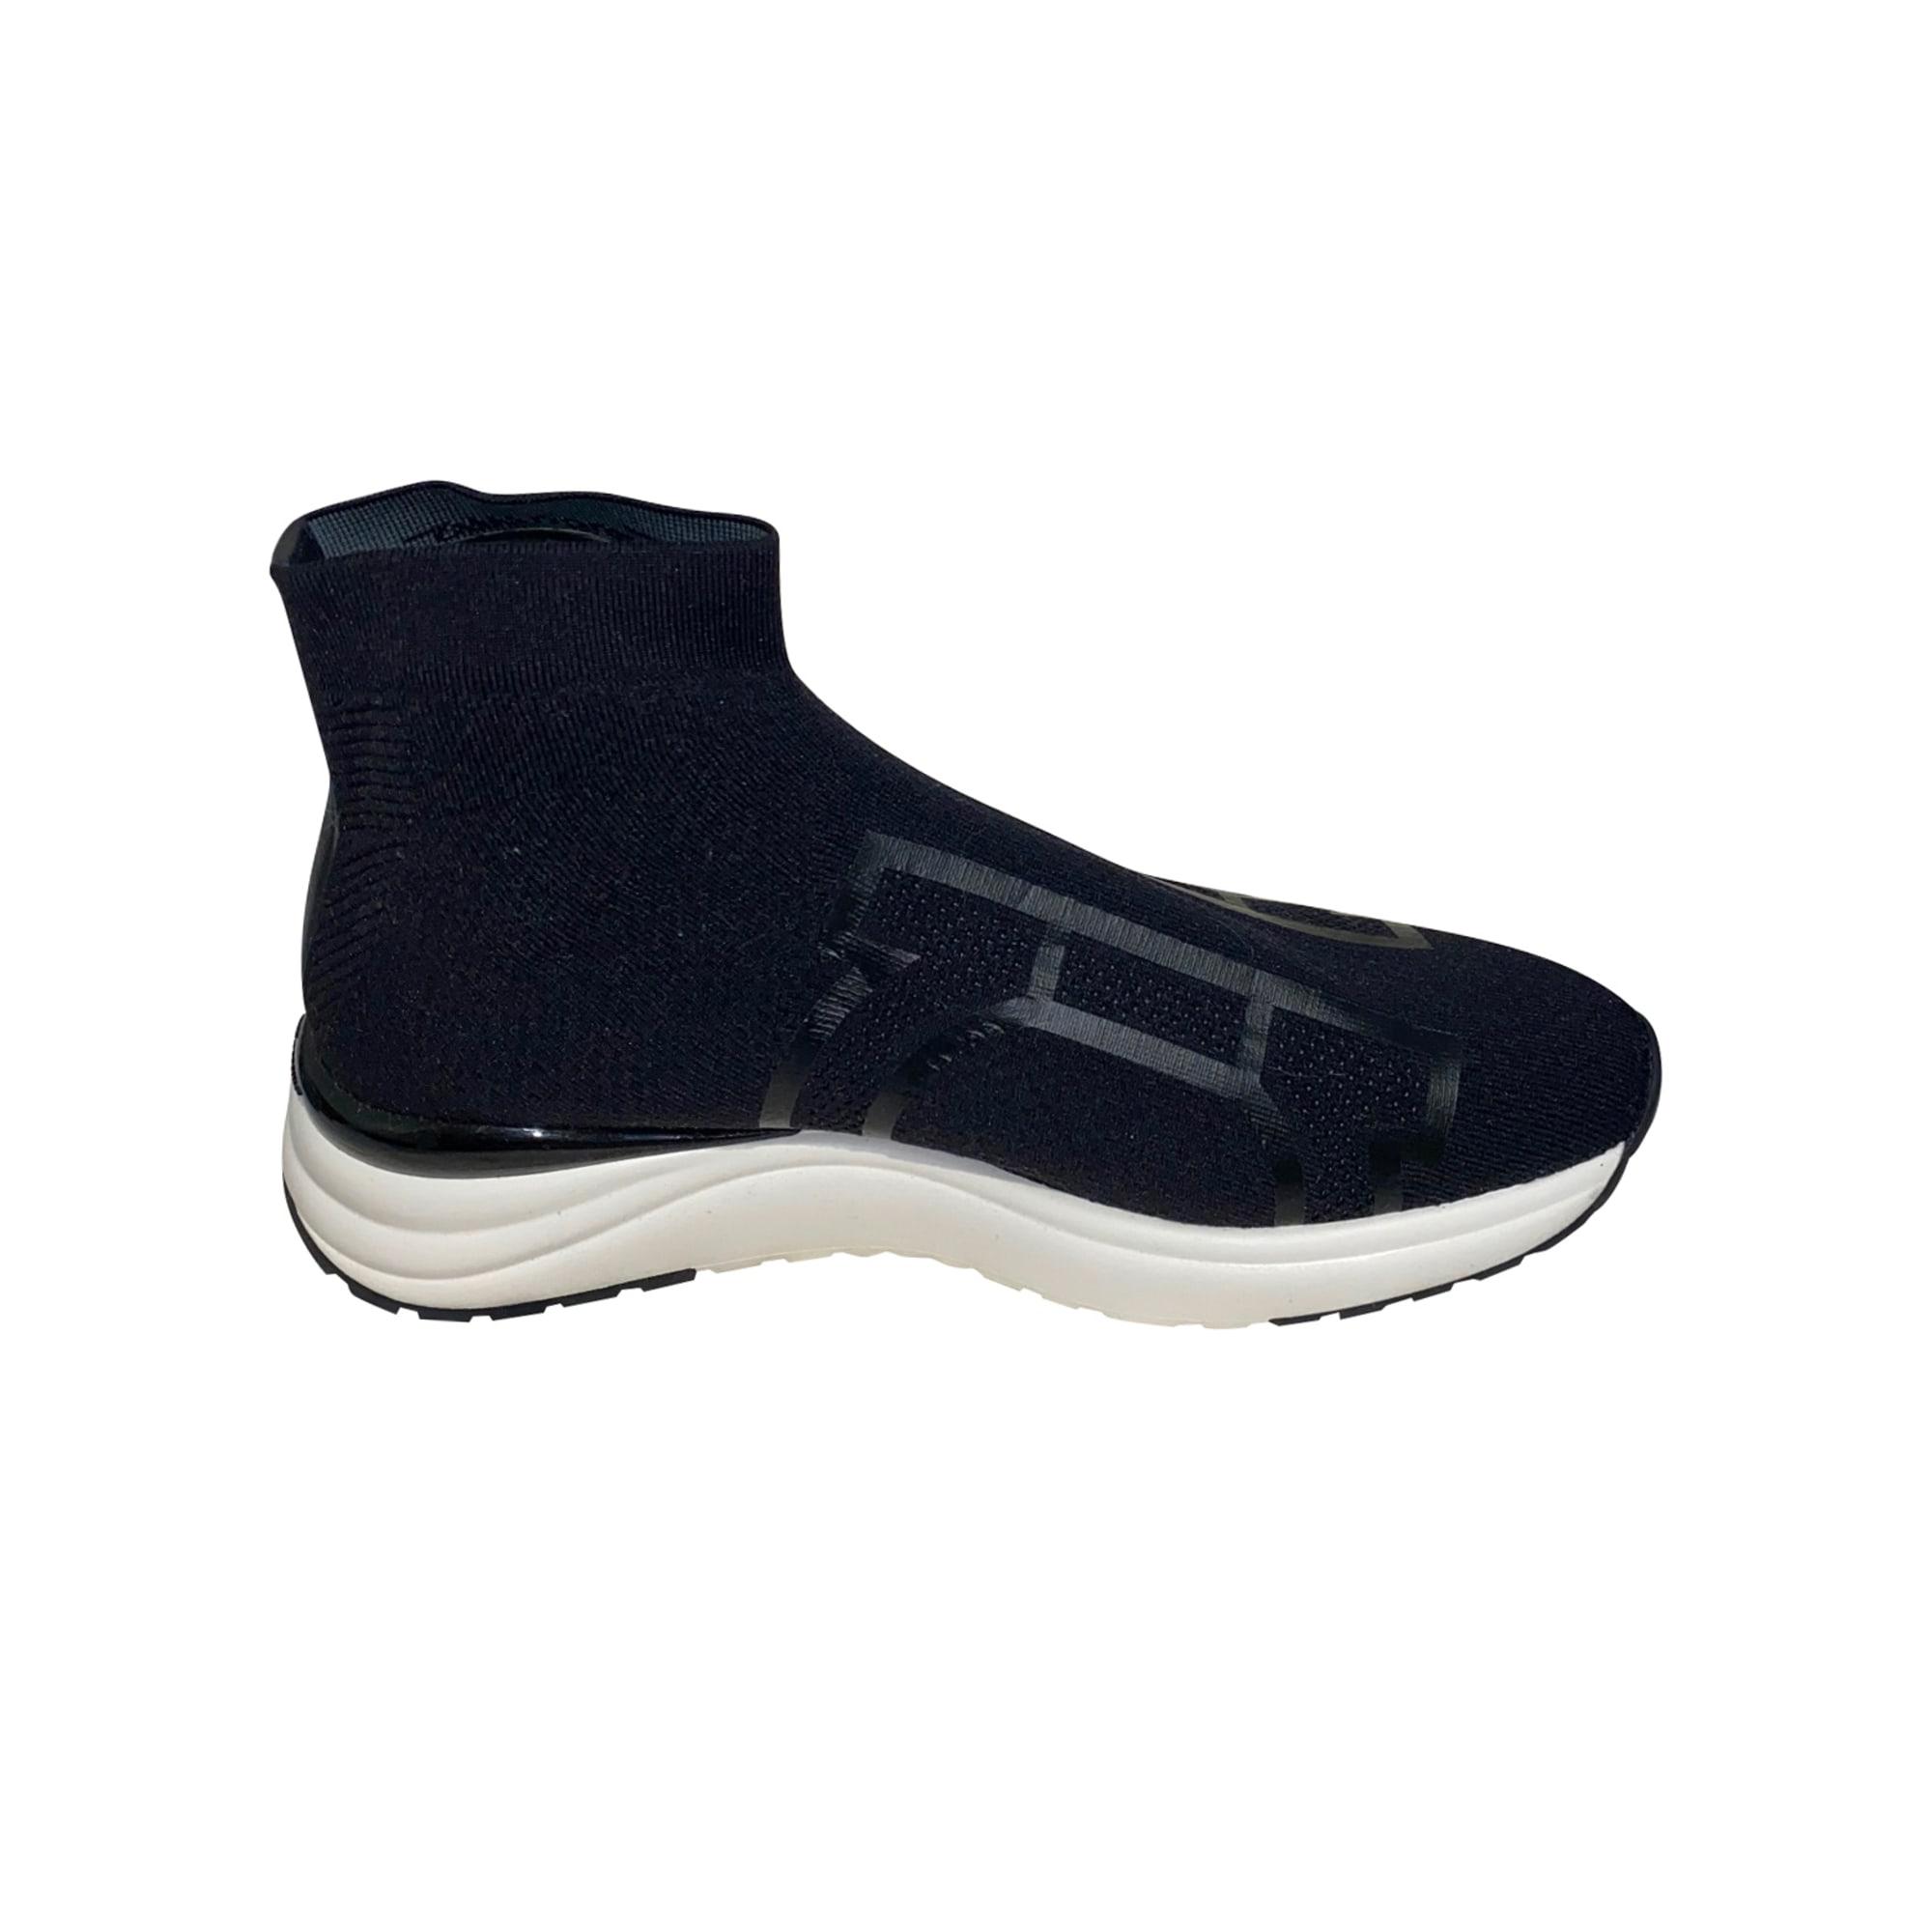 Sneakers SALVATORE FERRAGAMO Black